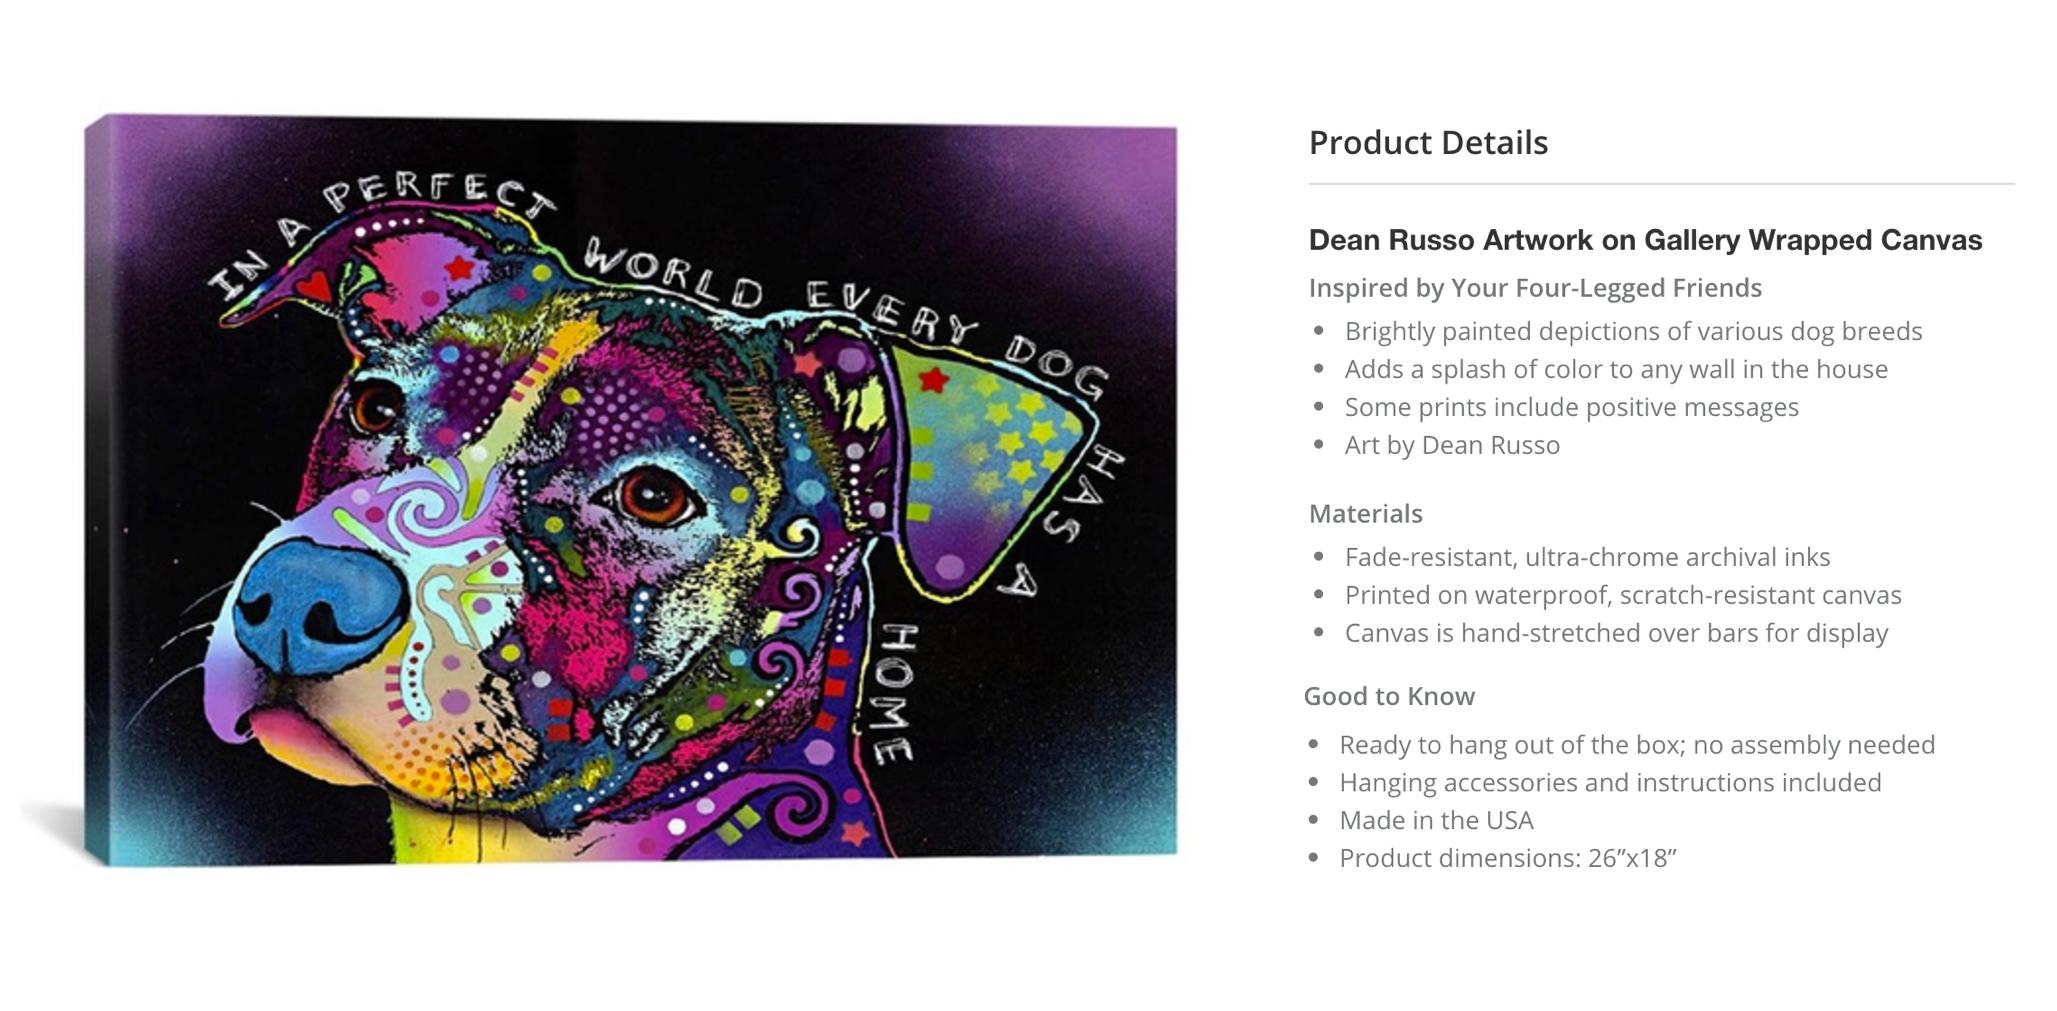 Dean Russo Canvas